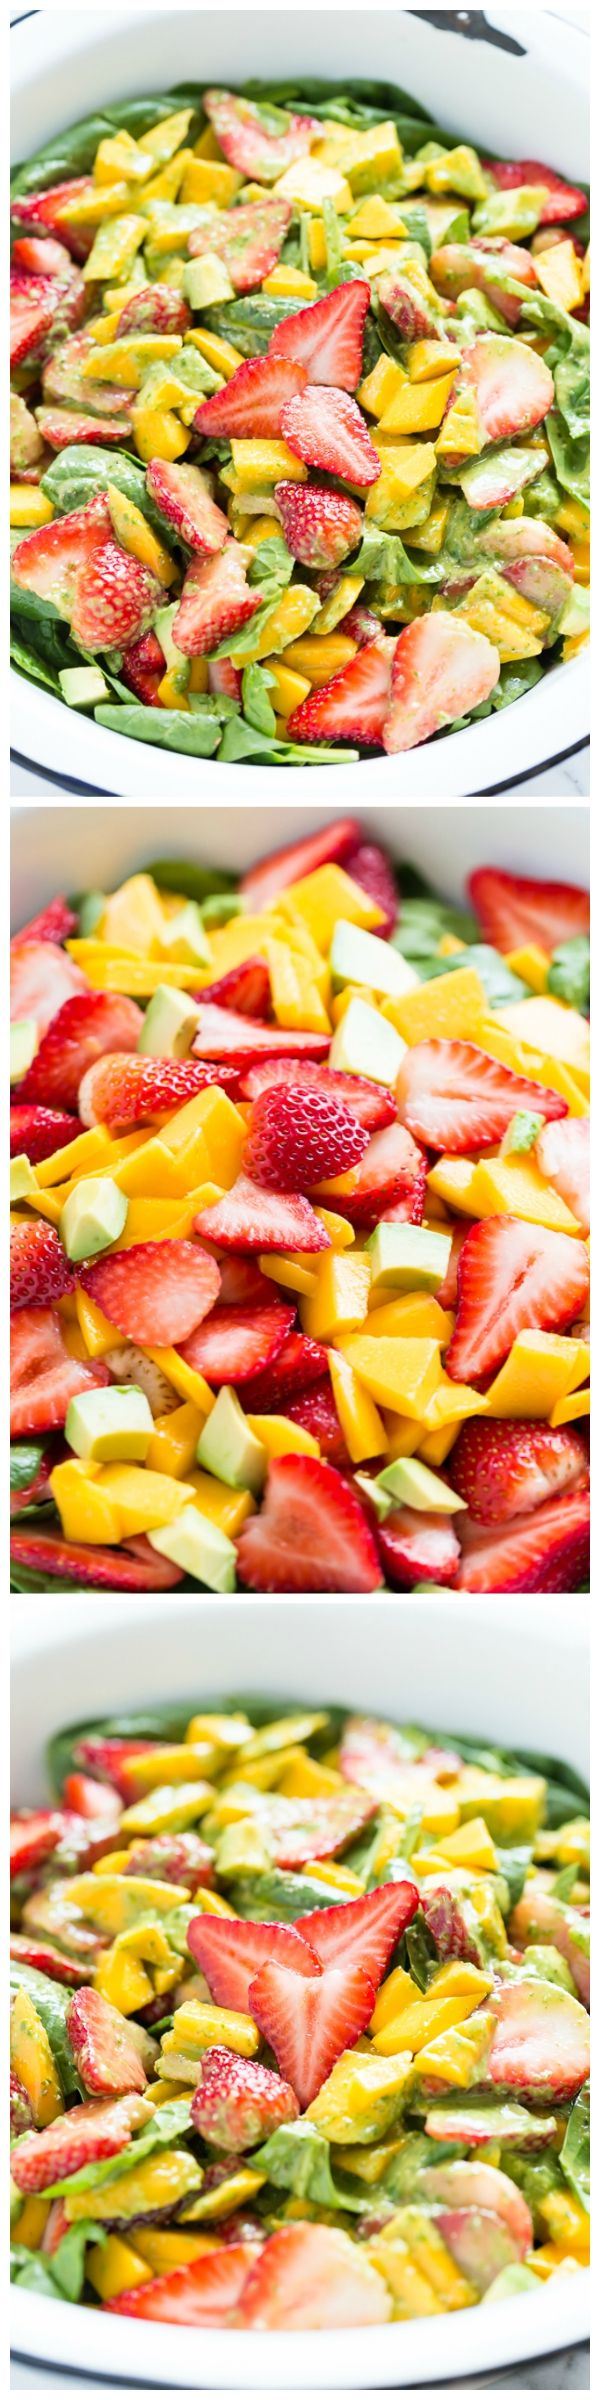 Strawberry Mango Spinach Salad with Creamy Basil Dressing - a fresh, simple taste of Spring!